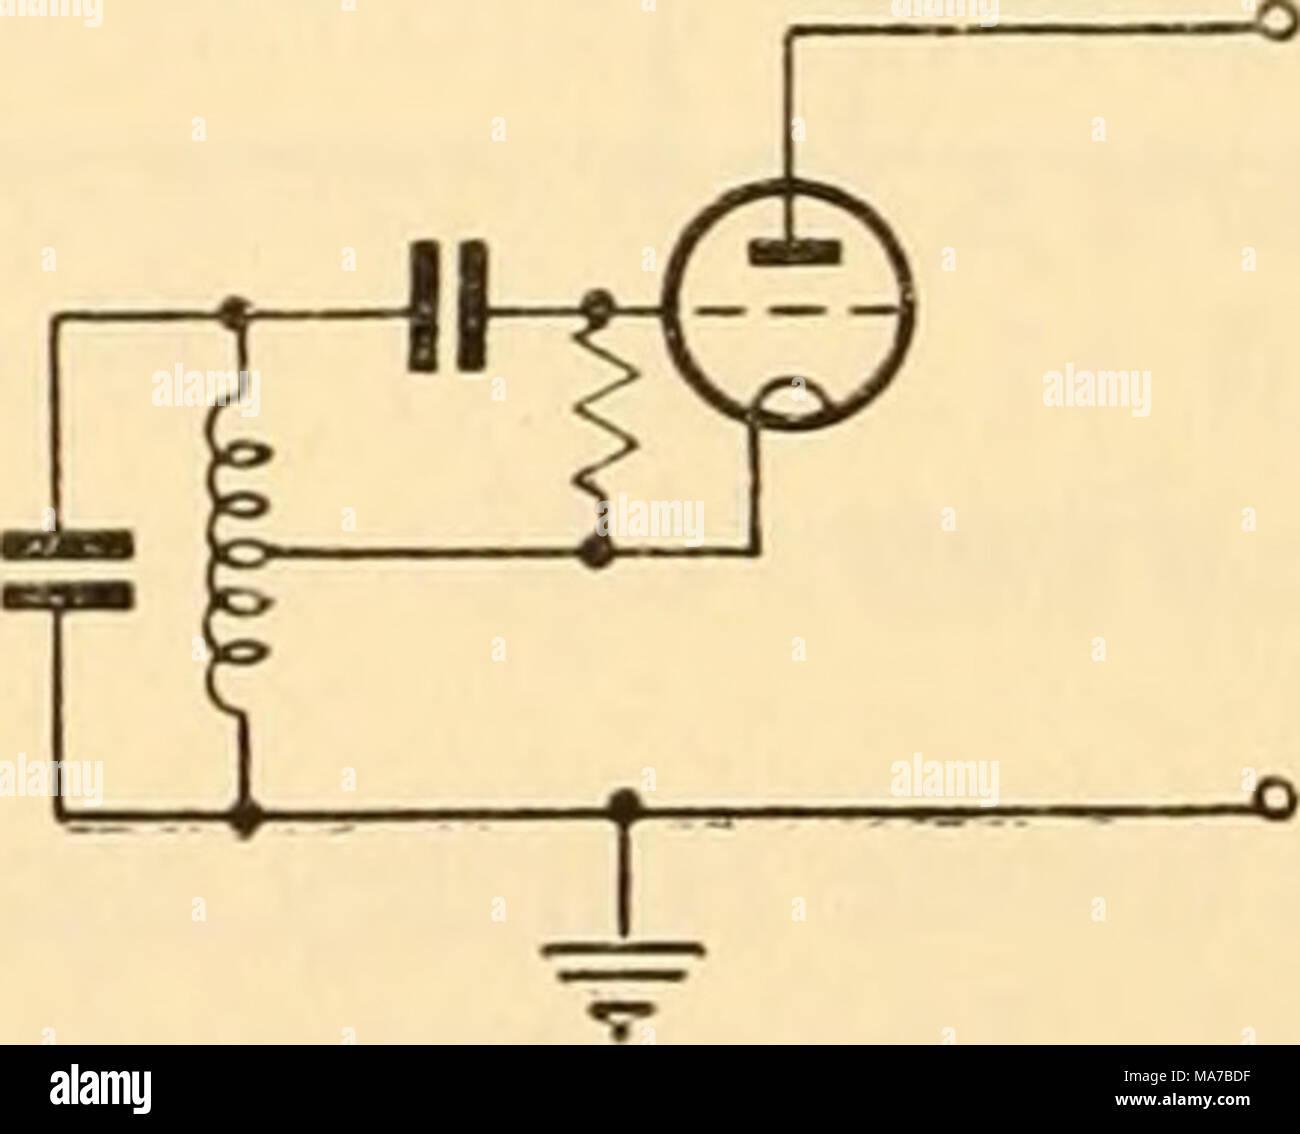 Actuator Relay Control Circuit Solenoid Valve Schematic Flip Flop